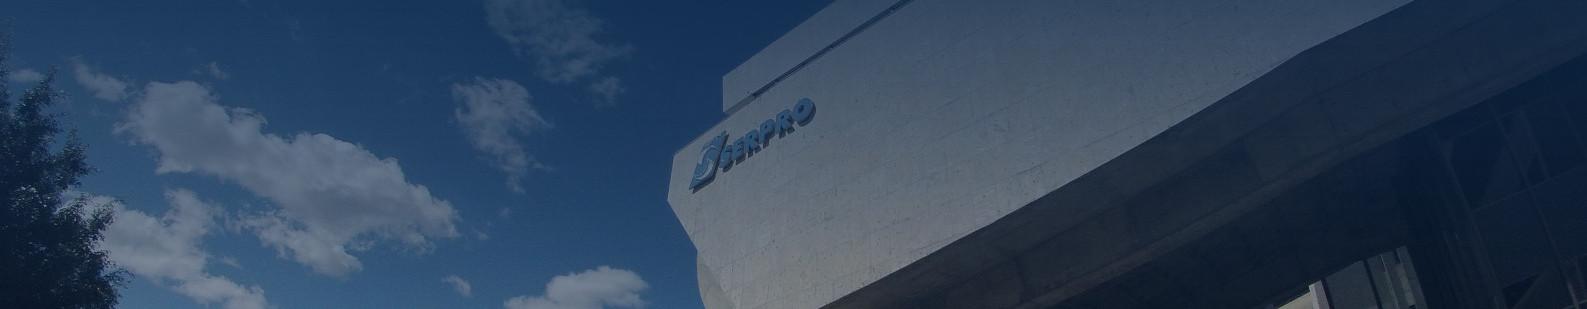 http://www.serpro.gov.br/menu/quem-somos